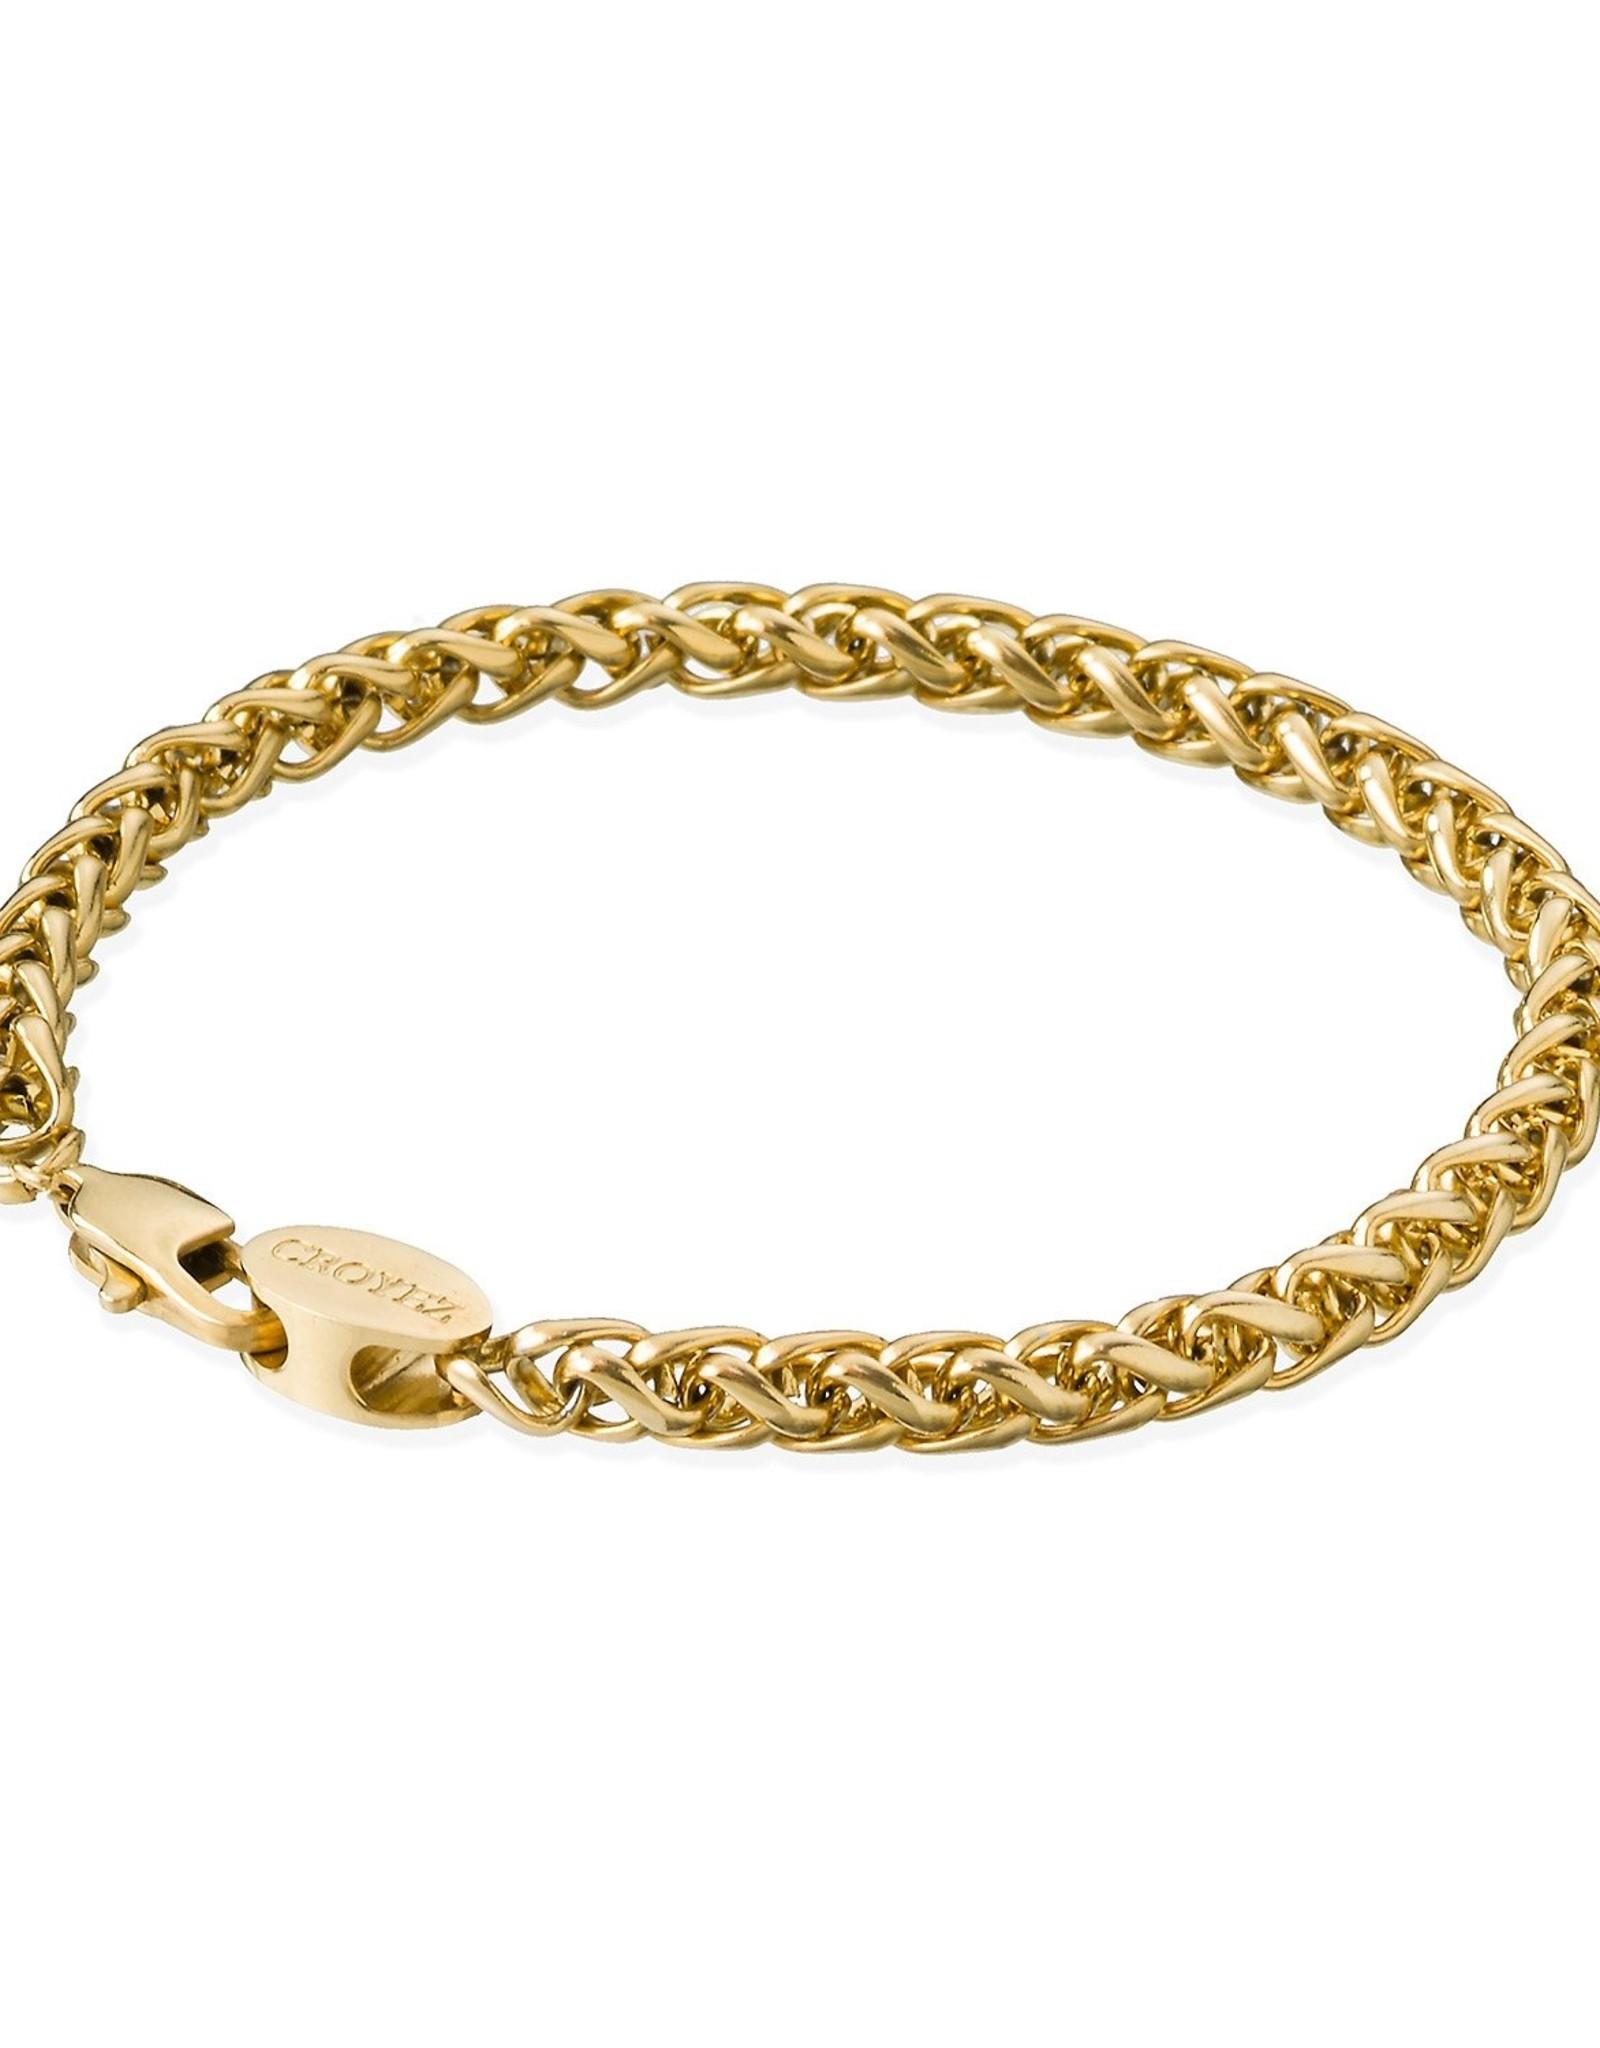 Croyez Bracelet wheat 5mm 14k gold 21cm